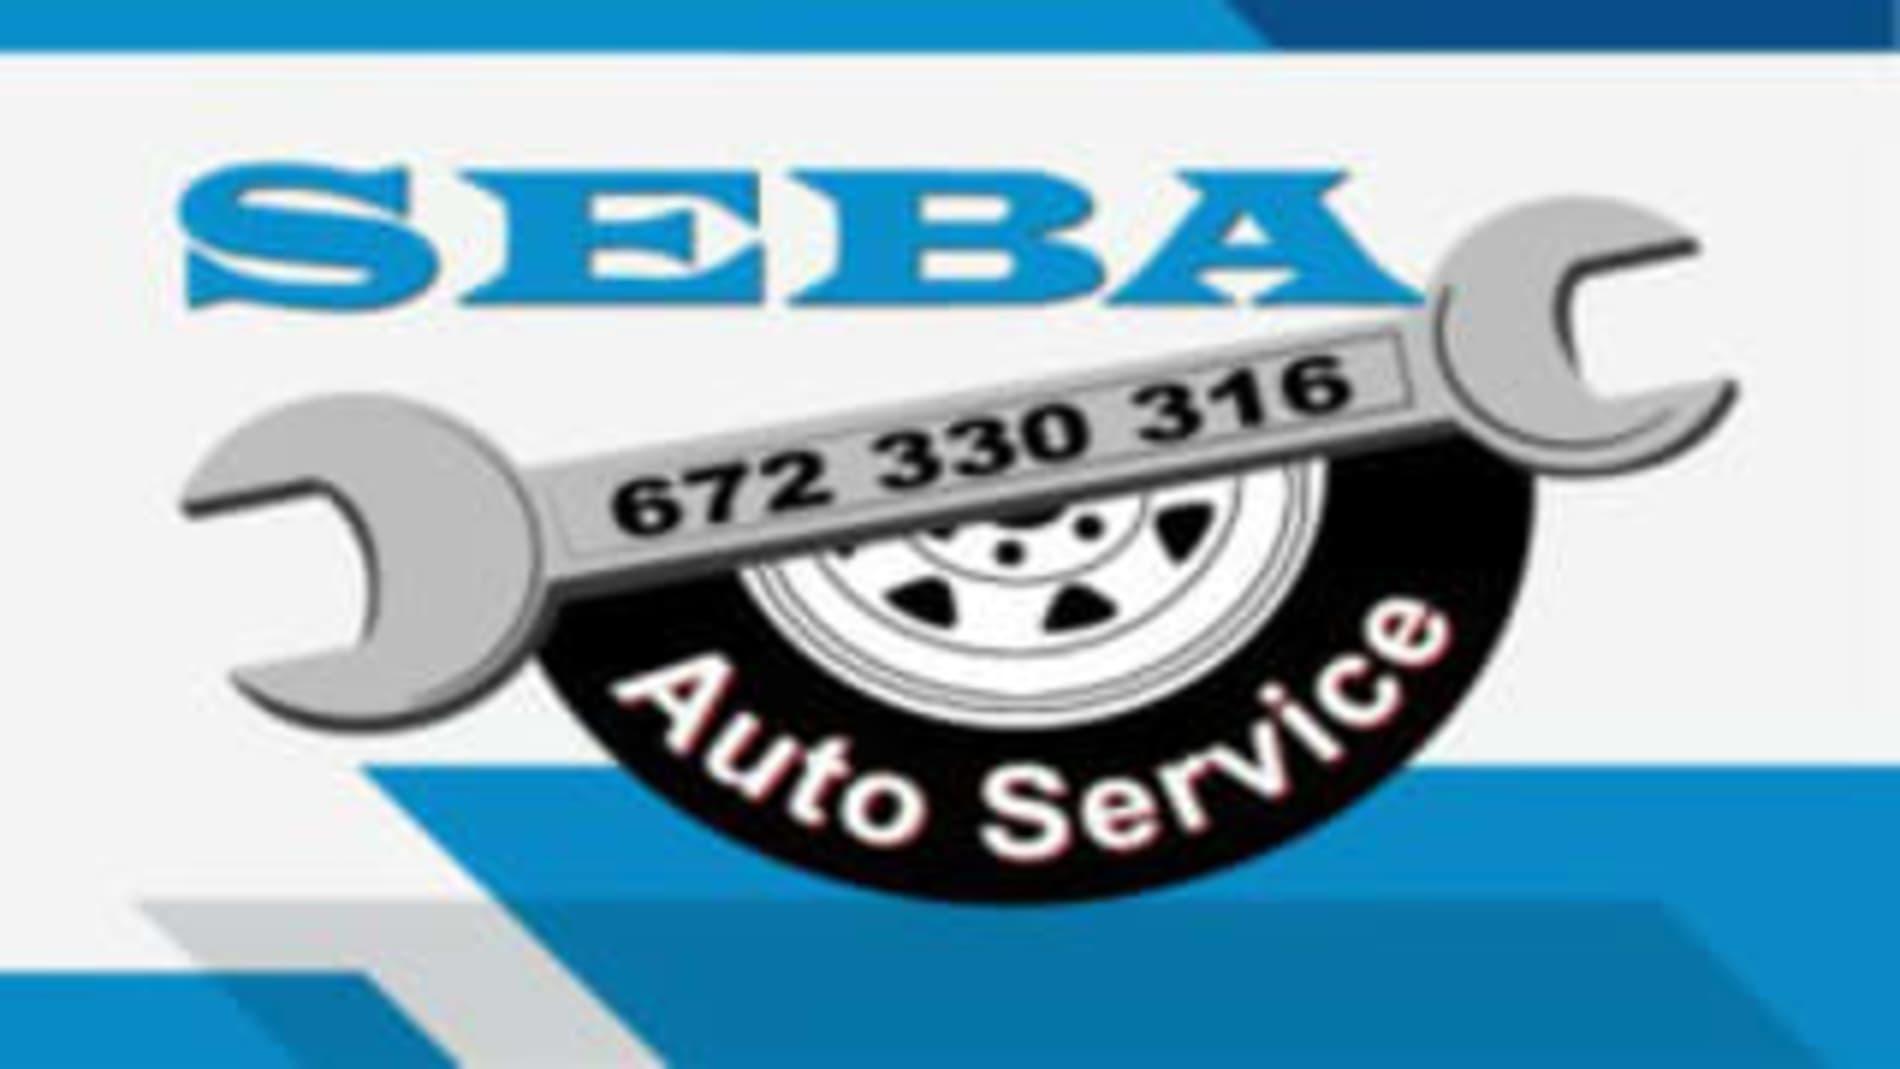 Seba Auto Service